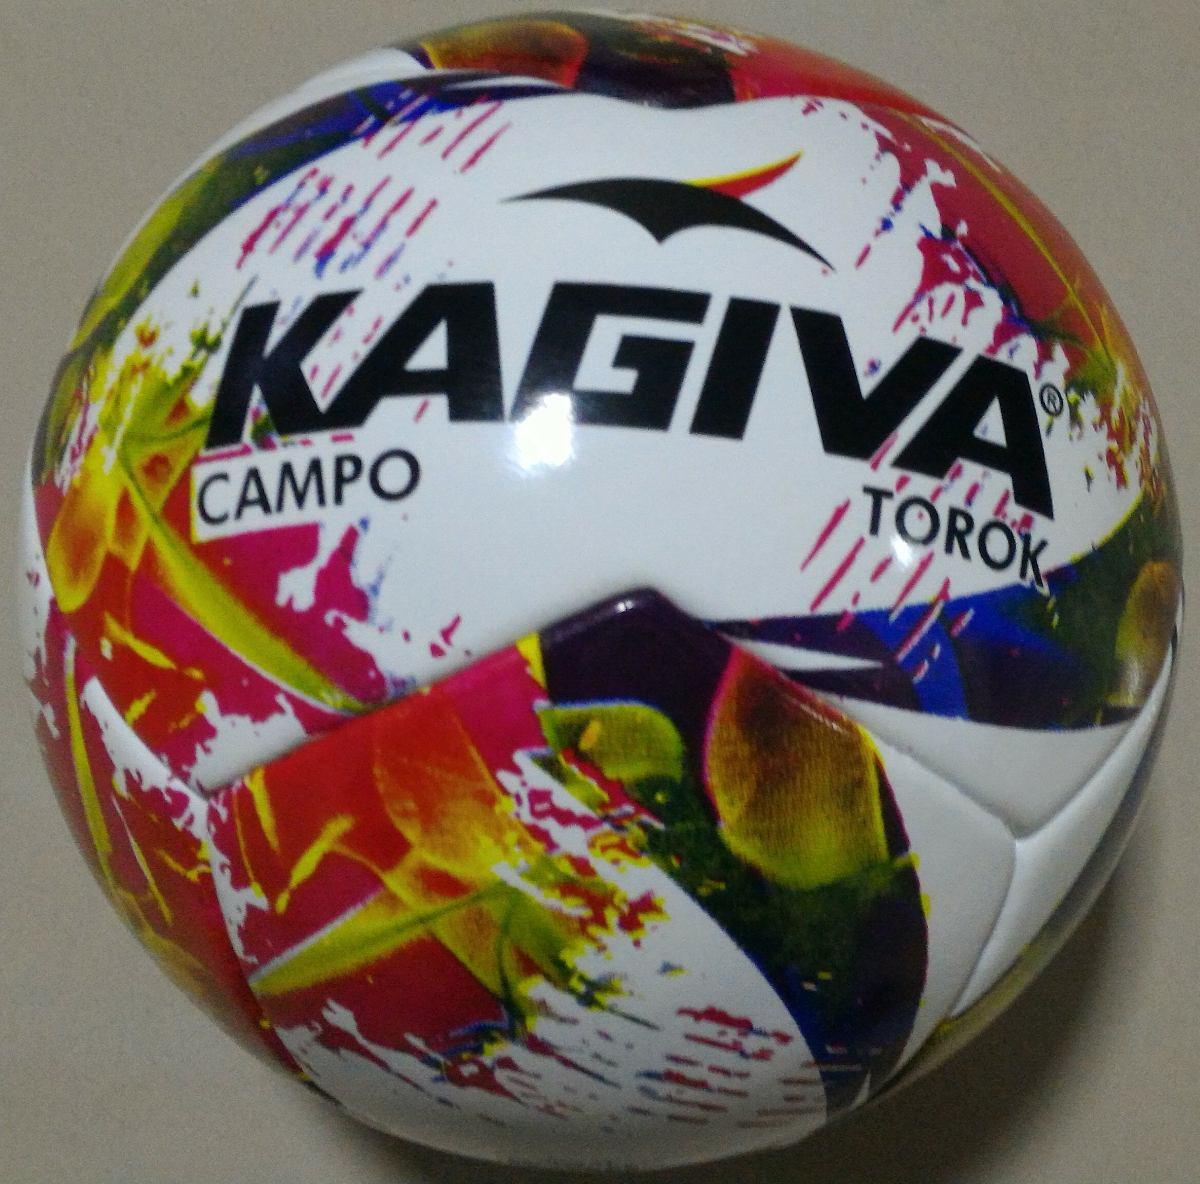 Bola Futebol Campo Kagiva Torok - R  85 14c81262a926f